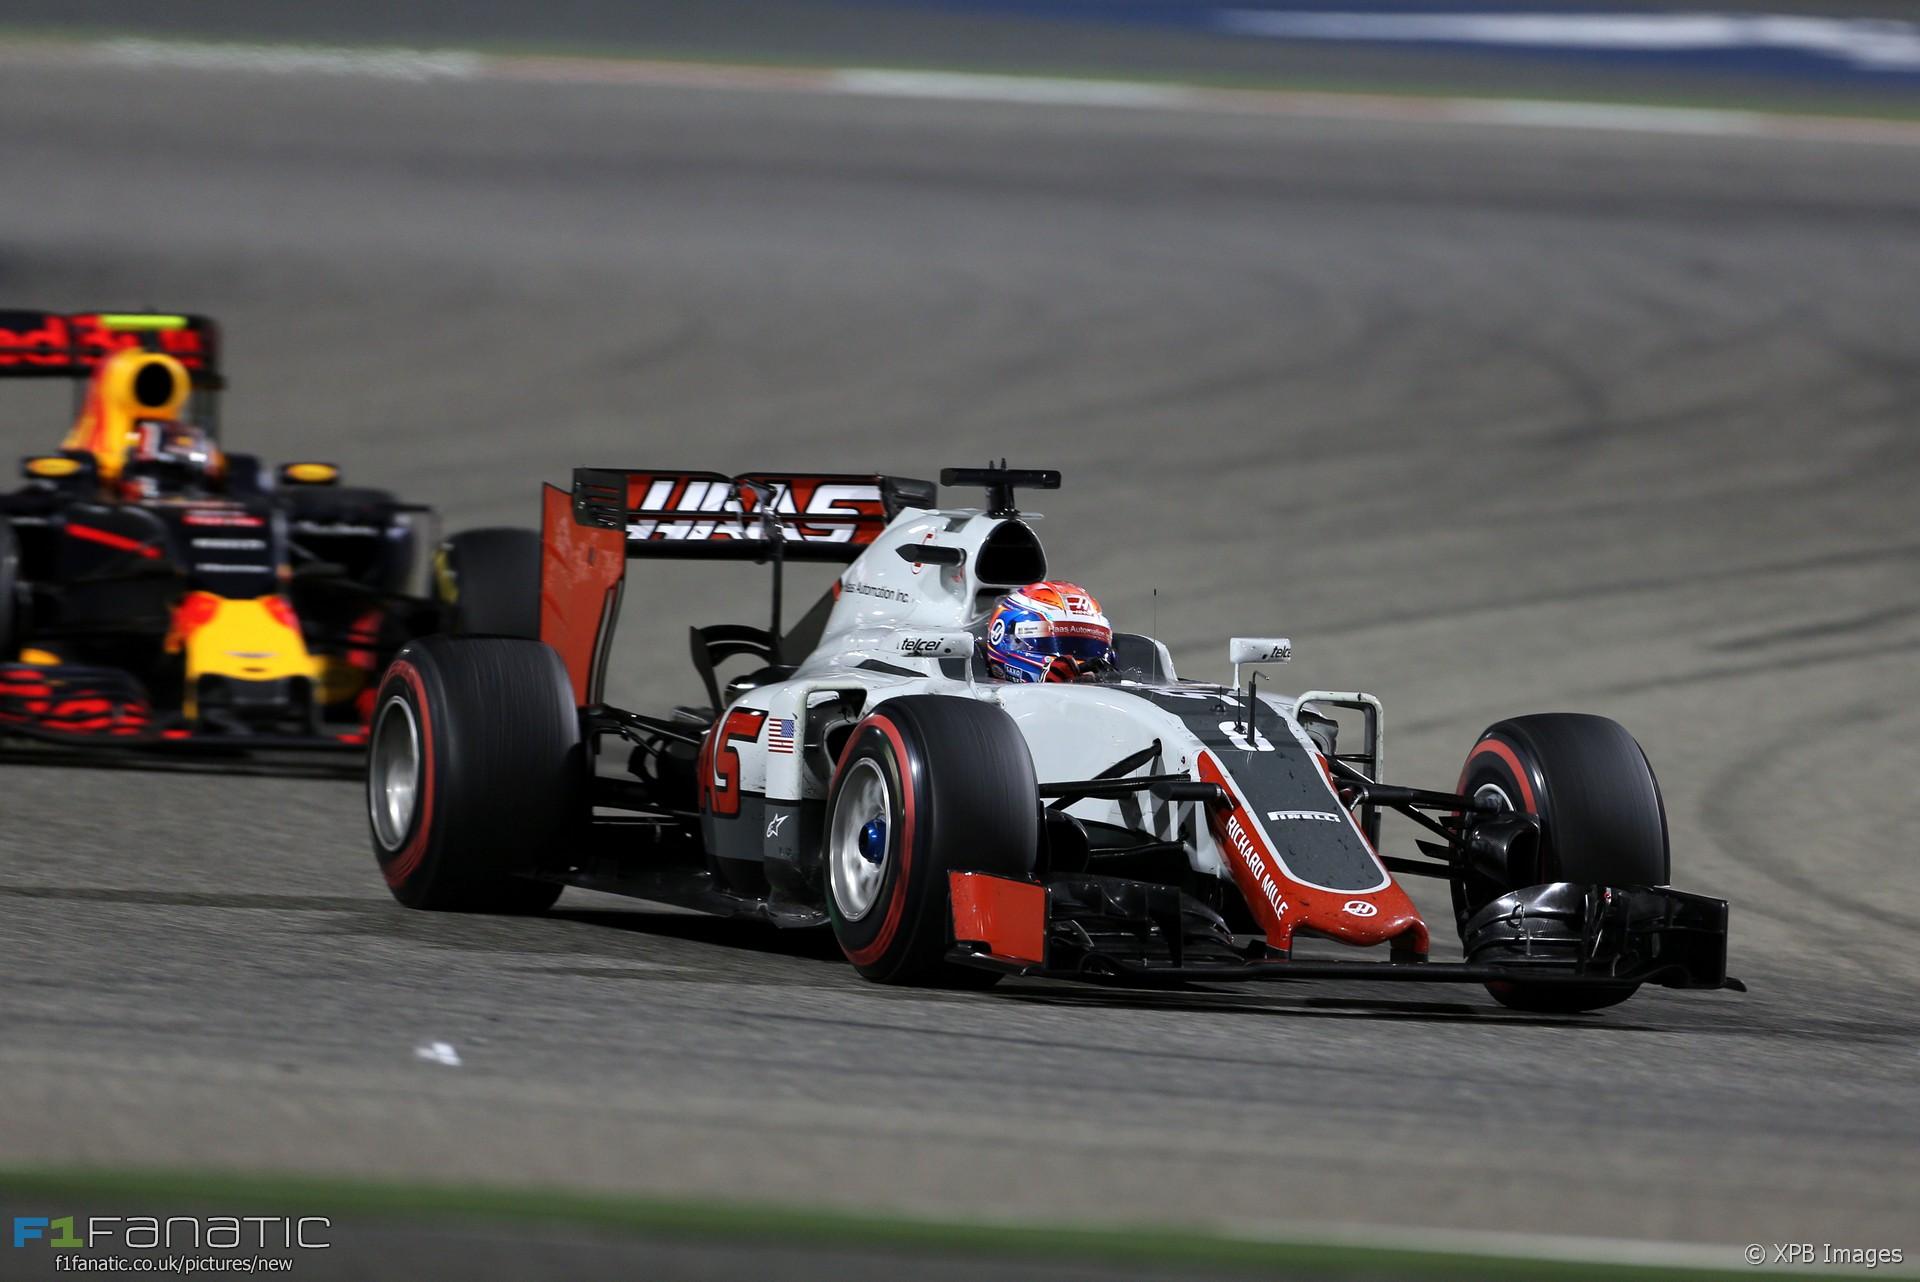 Romain Grosjean, Haas, Bahrain International Circuit, 2016